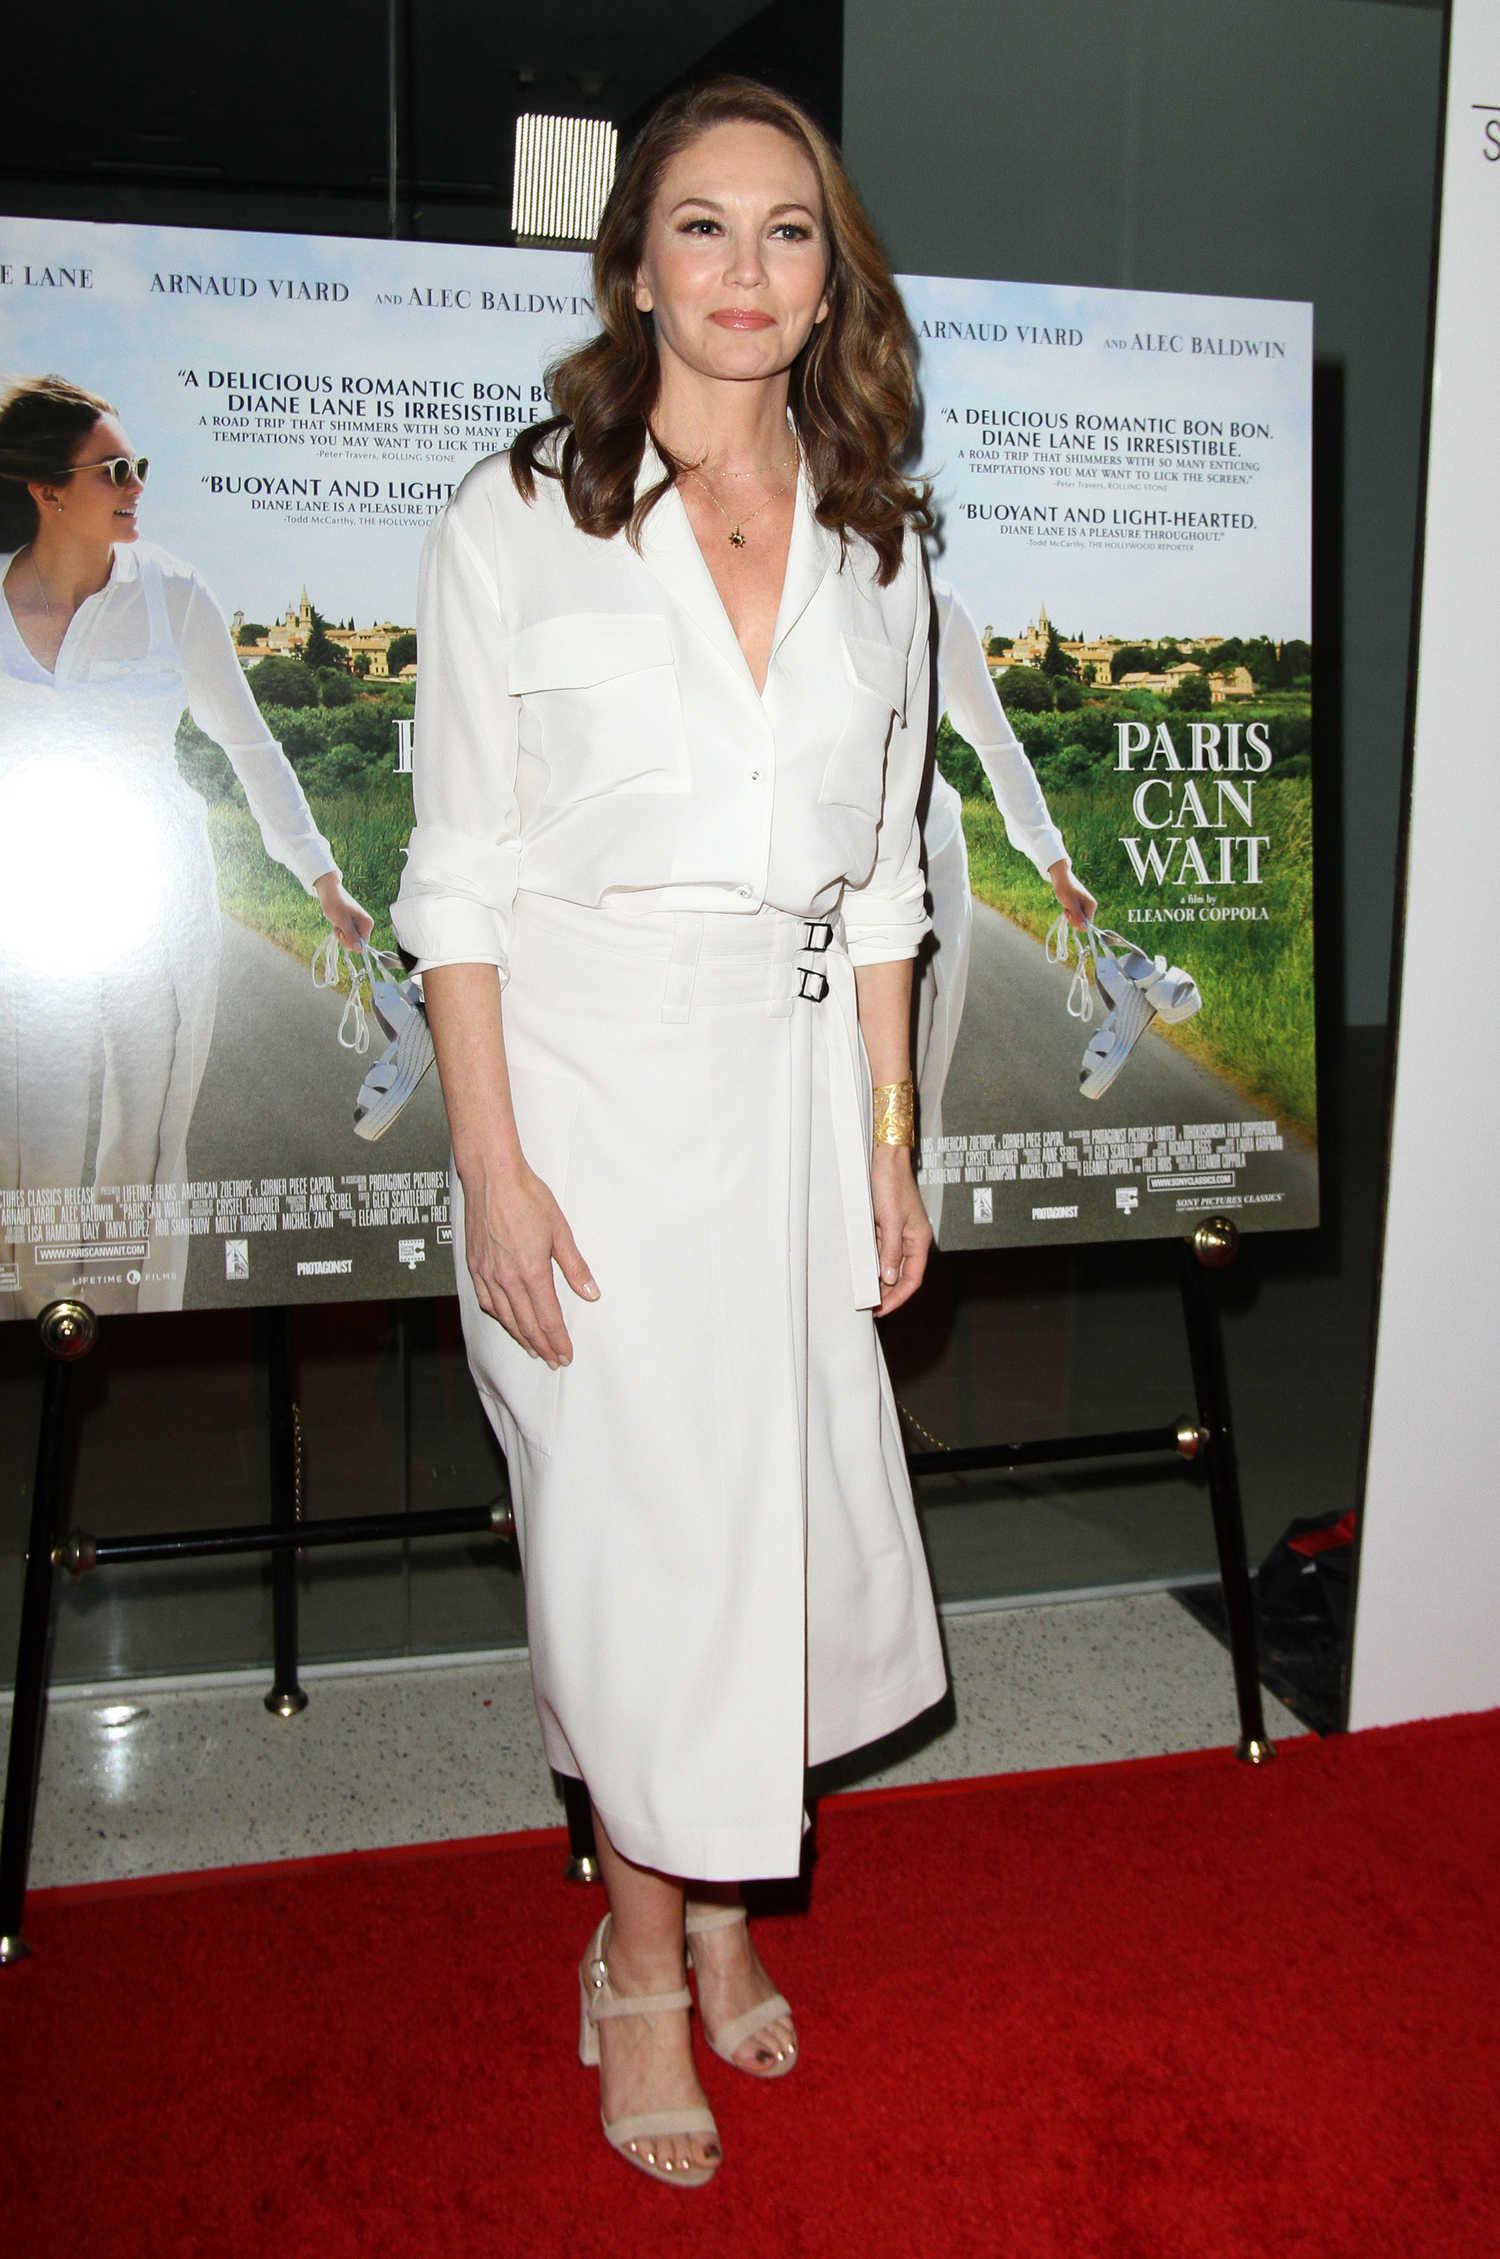 Diane Lane At The Paris Can Wait Premiere In Los Angeles